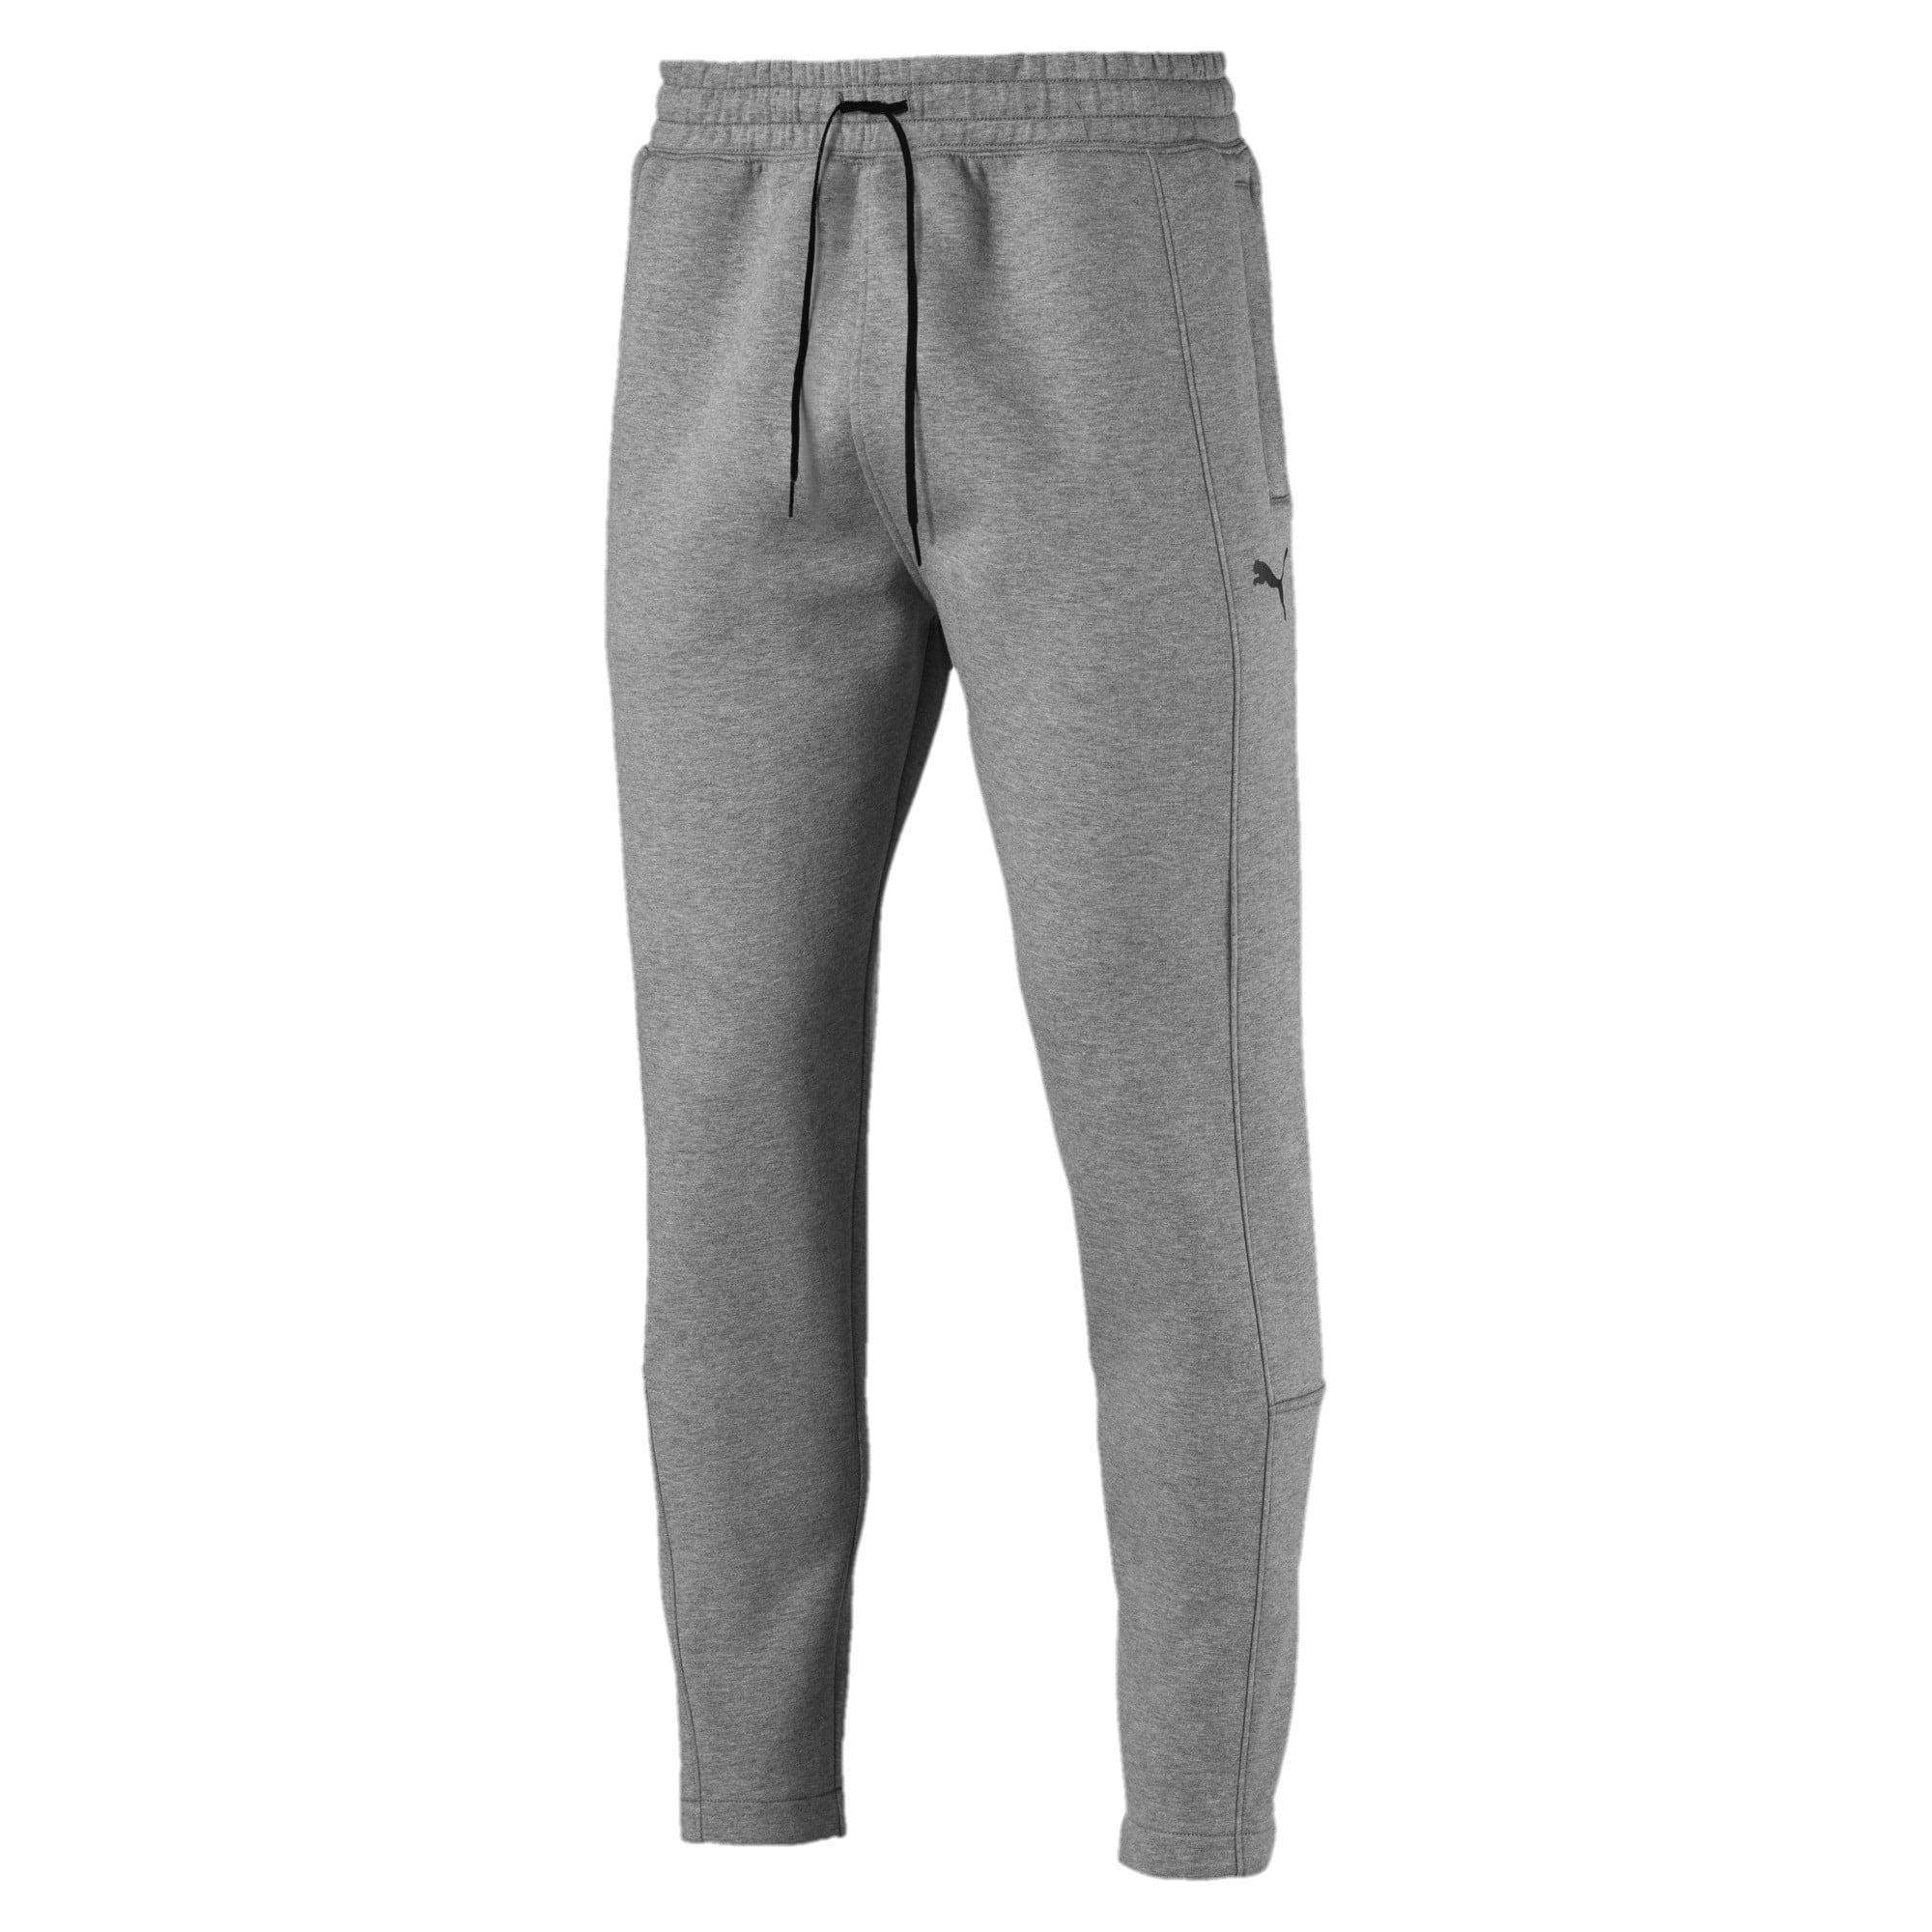 Thumbnail 1 of Epoch Knitted Men's Pants, Medium Gray Heather, medium-IND